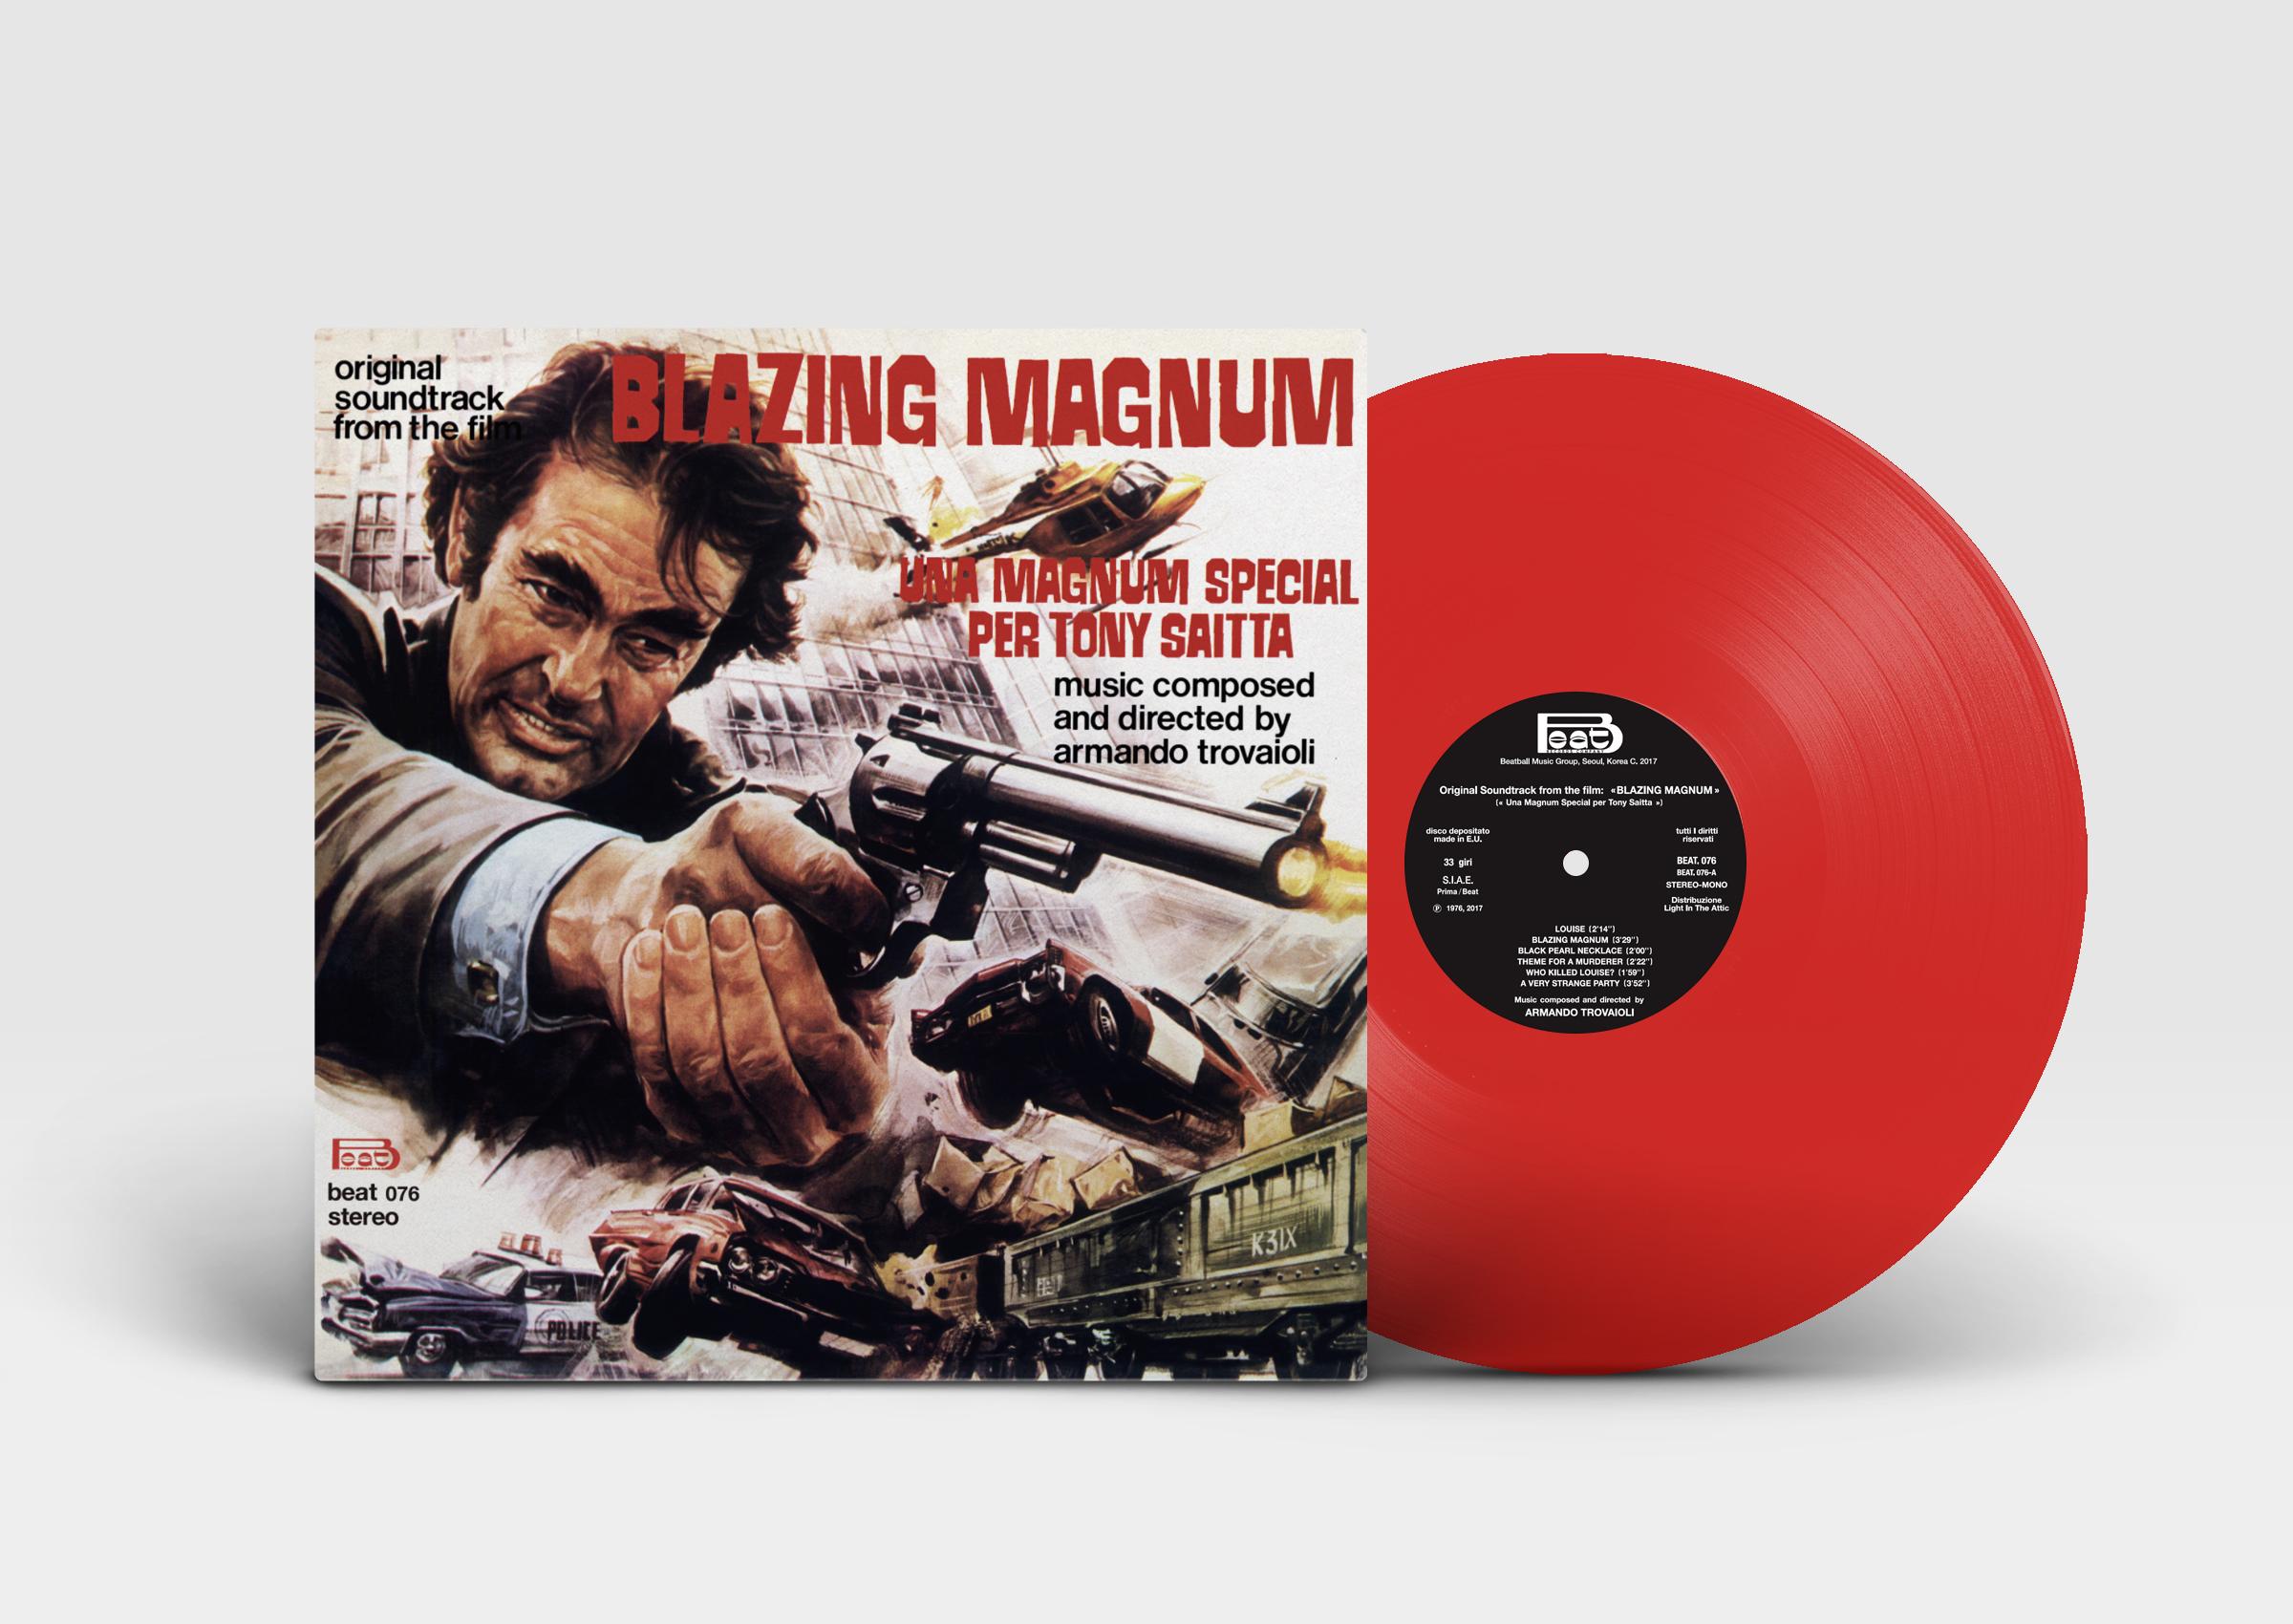 Blazing Magnum: Strange Shadows In An Empty Room (Original Soundtrack)